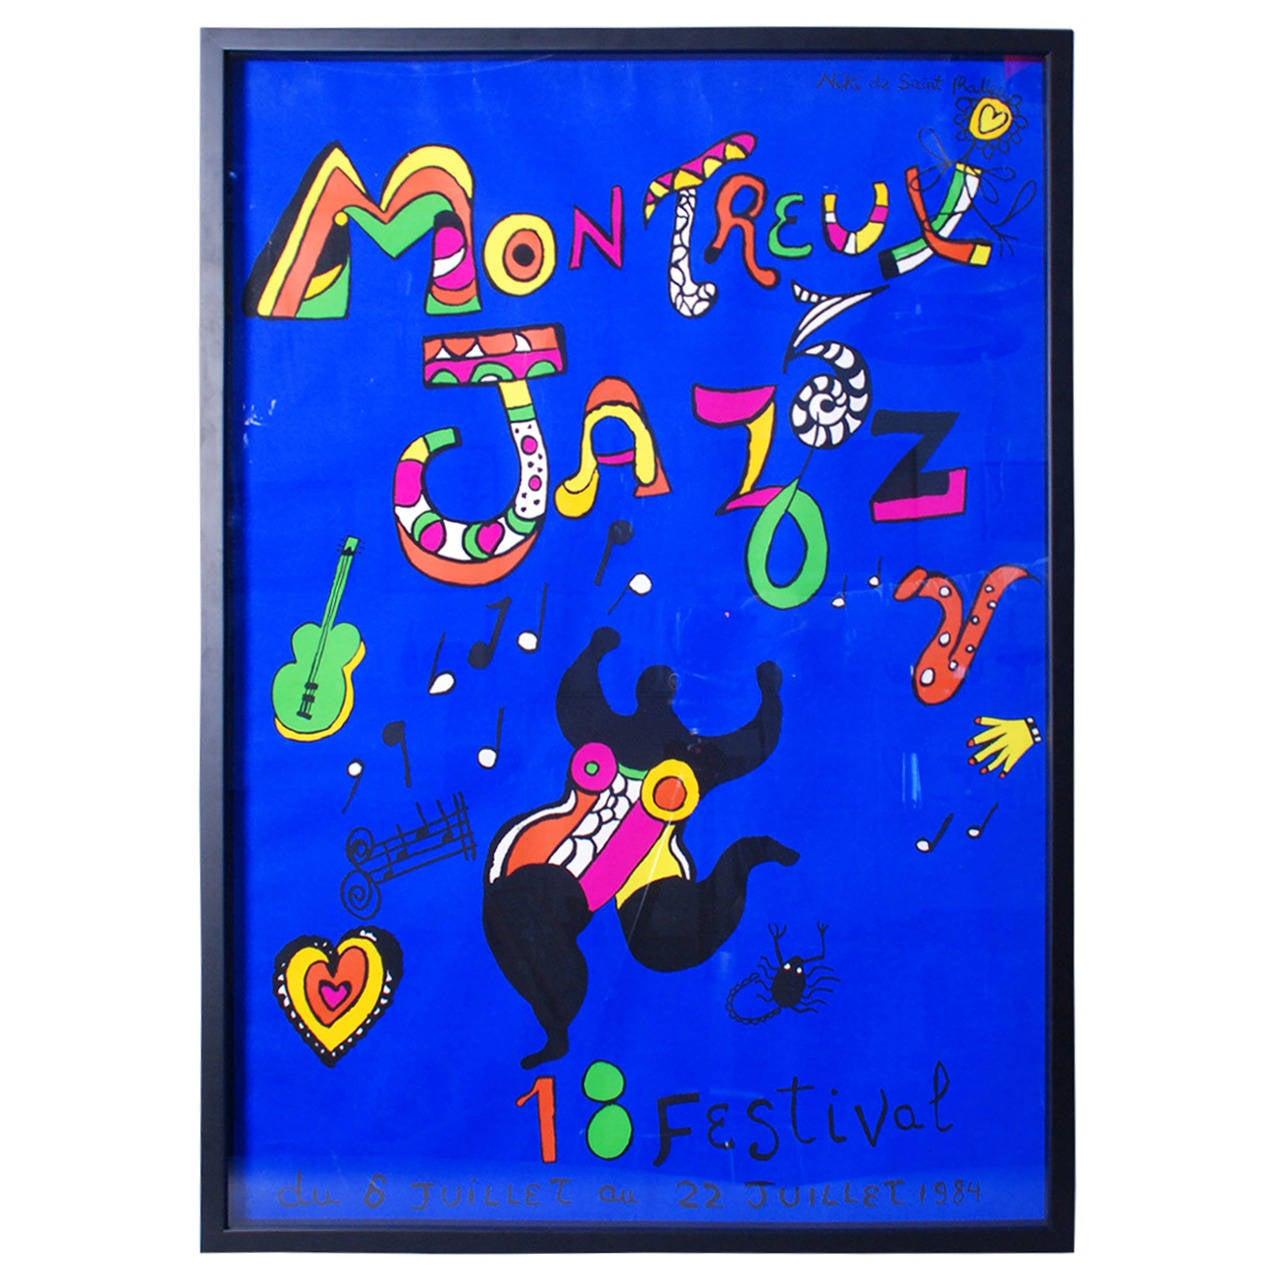 "Poster ""Montreux Jazz Festival"" by Niki de Saint Phalle 1983"